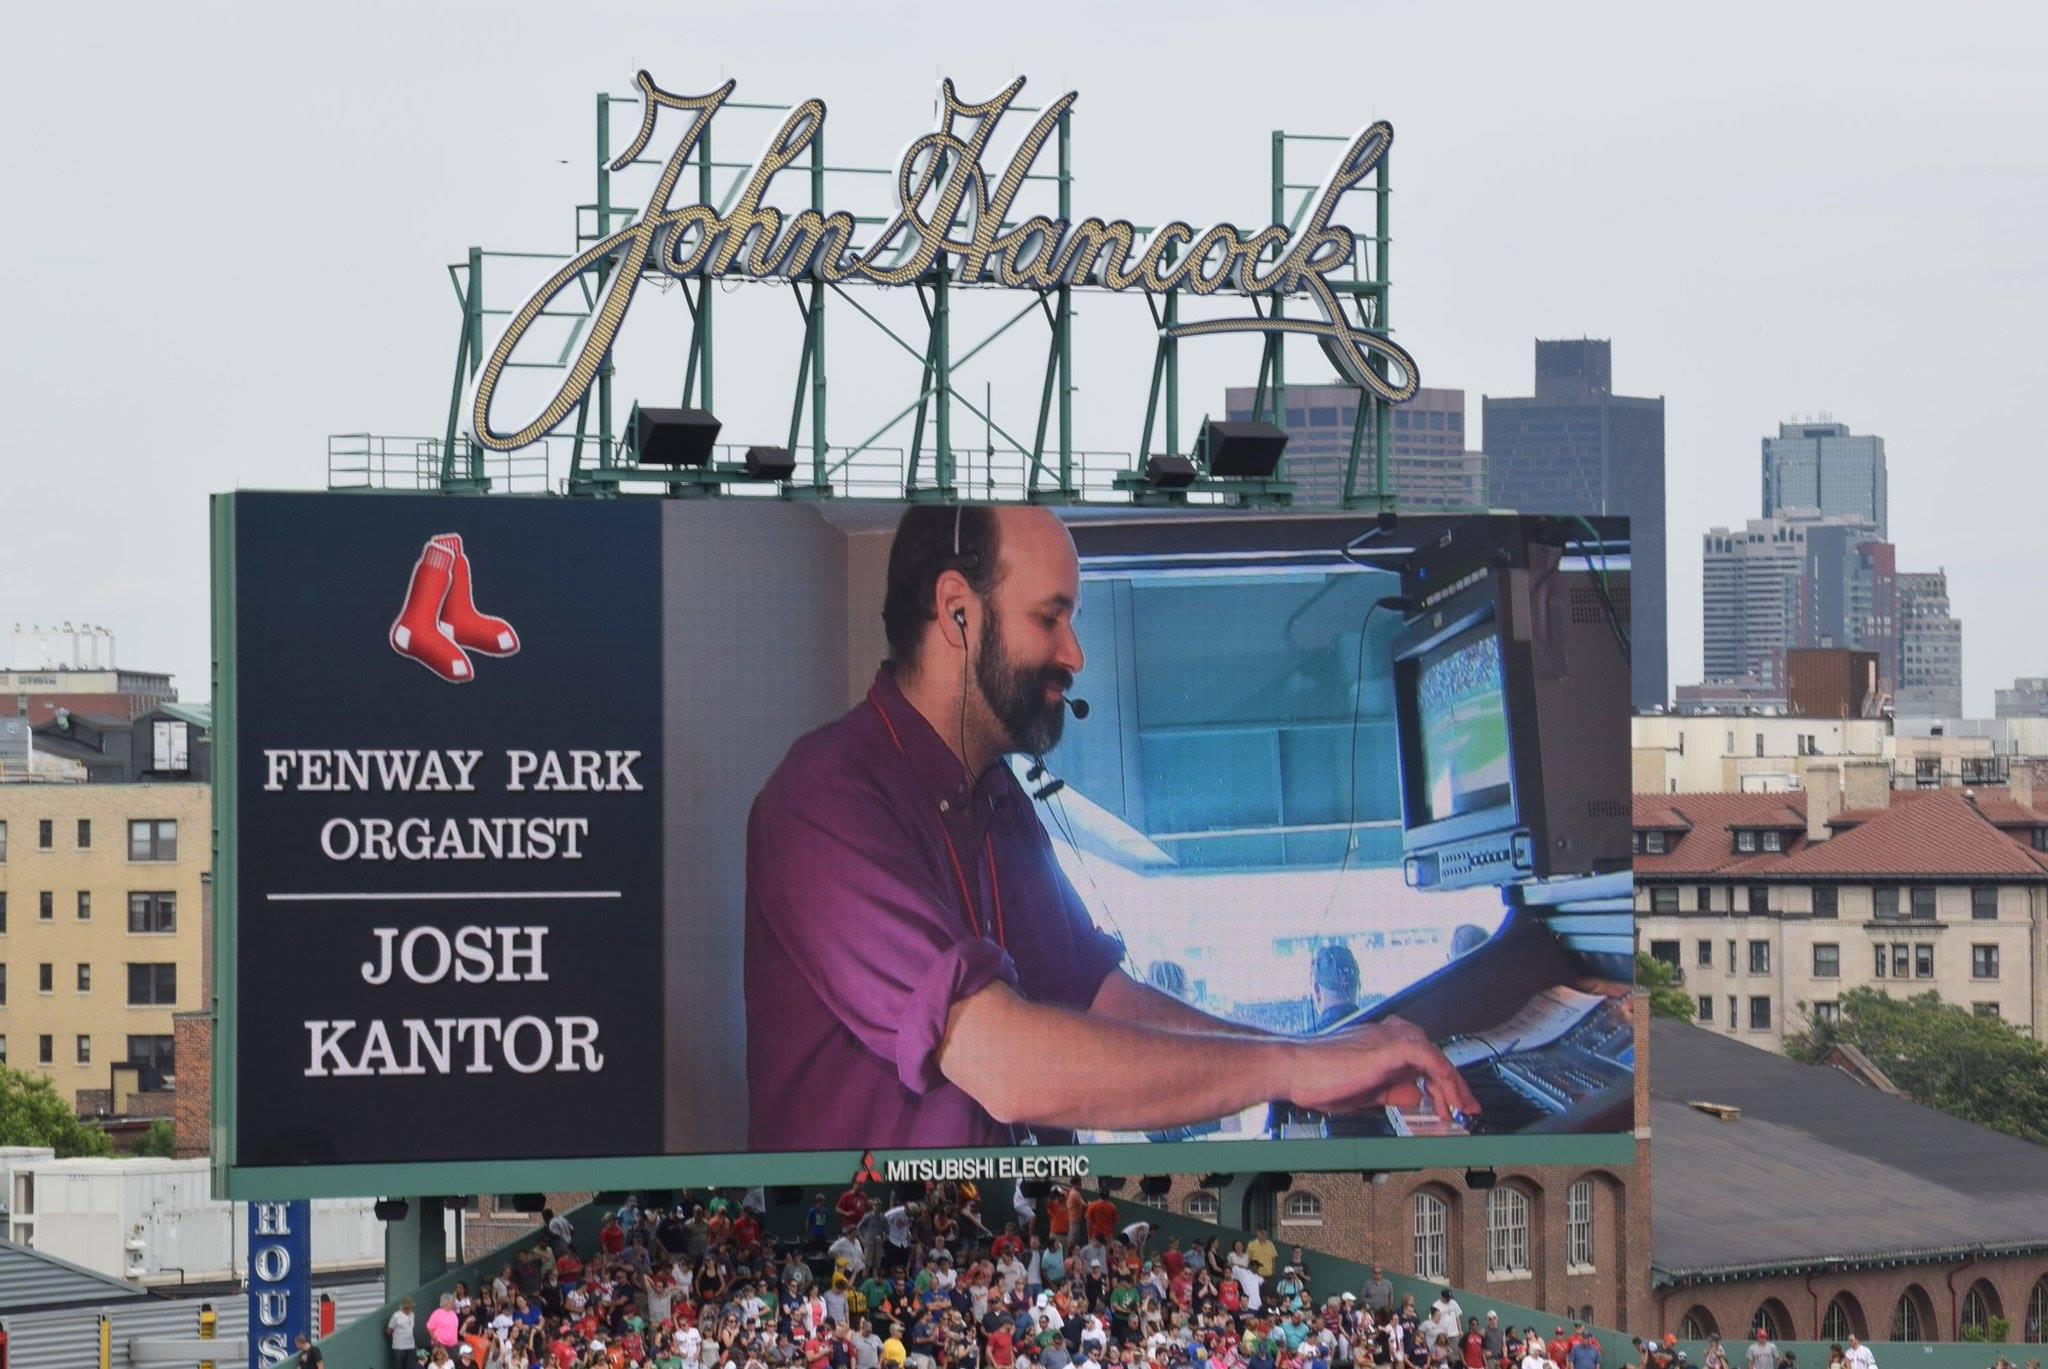 PODCAST EPISODE 013: Boston Red Sox Organist Josh Kantor